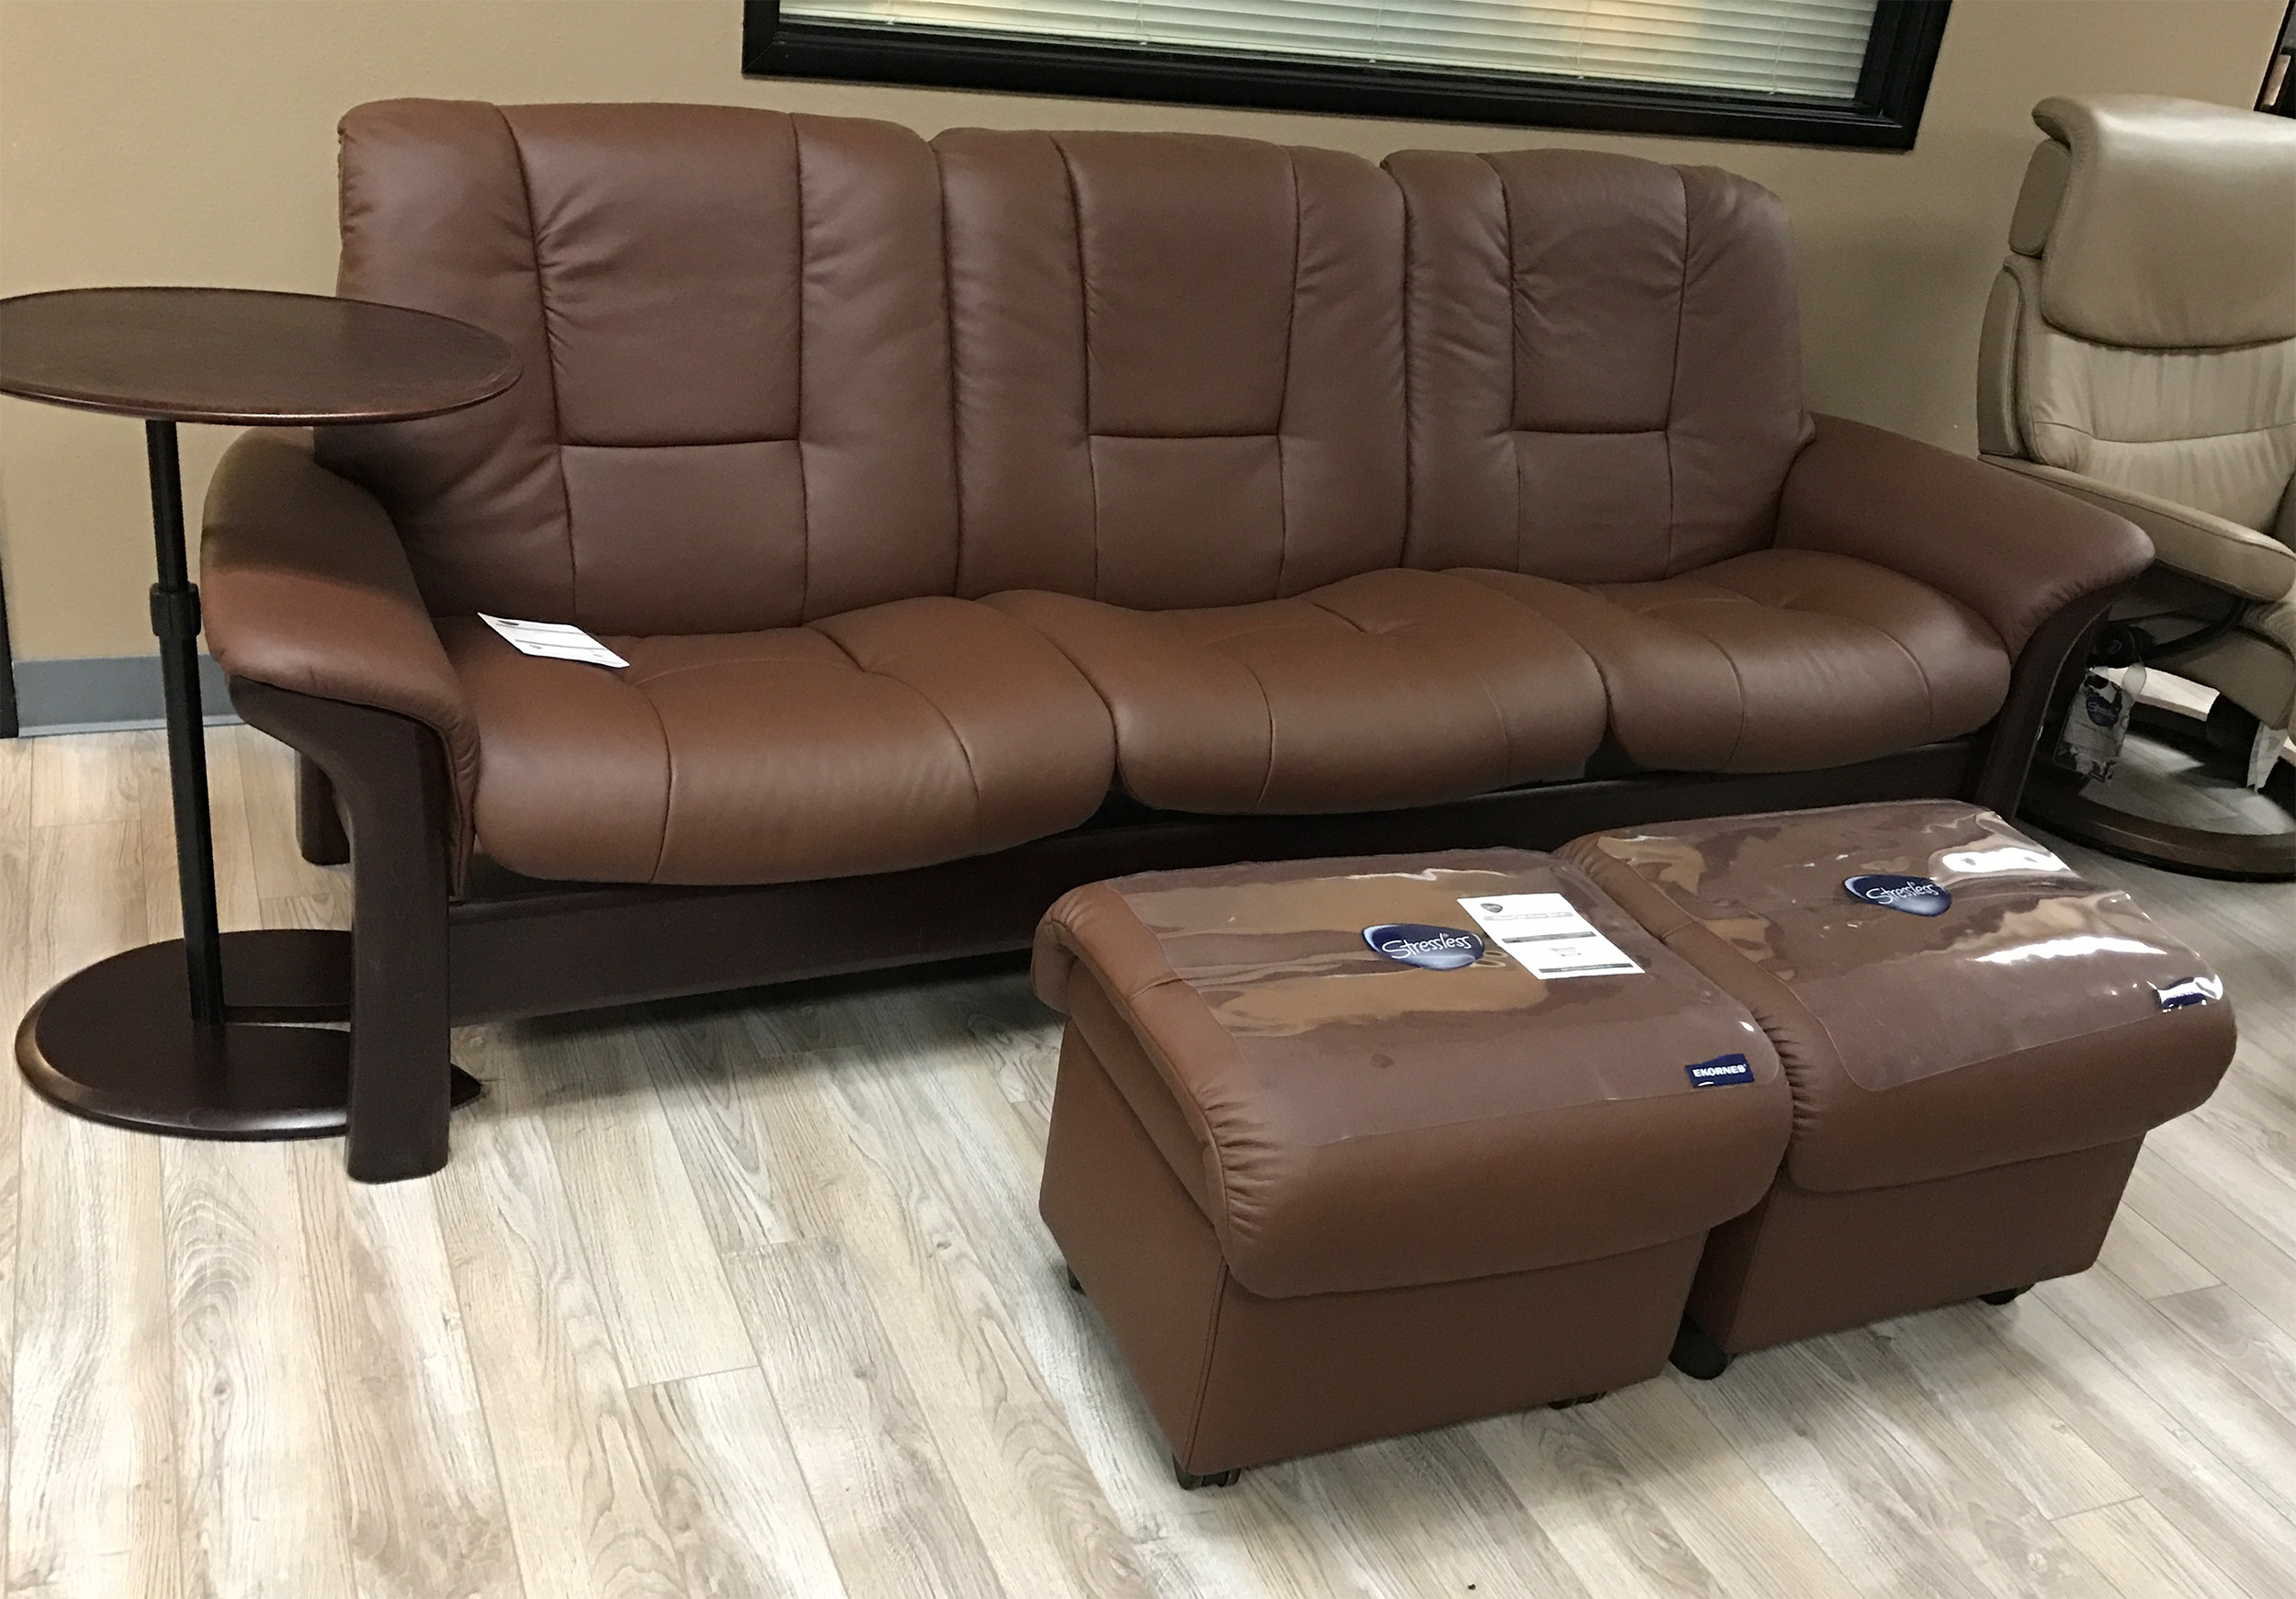 Stressless Buckingham 3 Seat Low Back Sofa Paloma Brown Leather